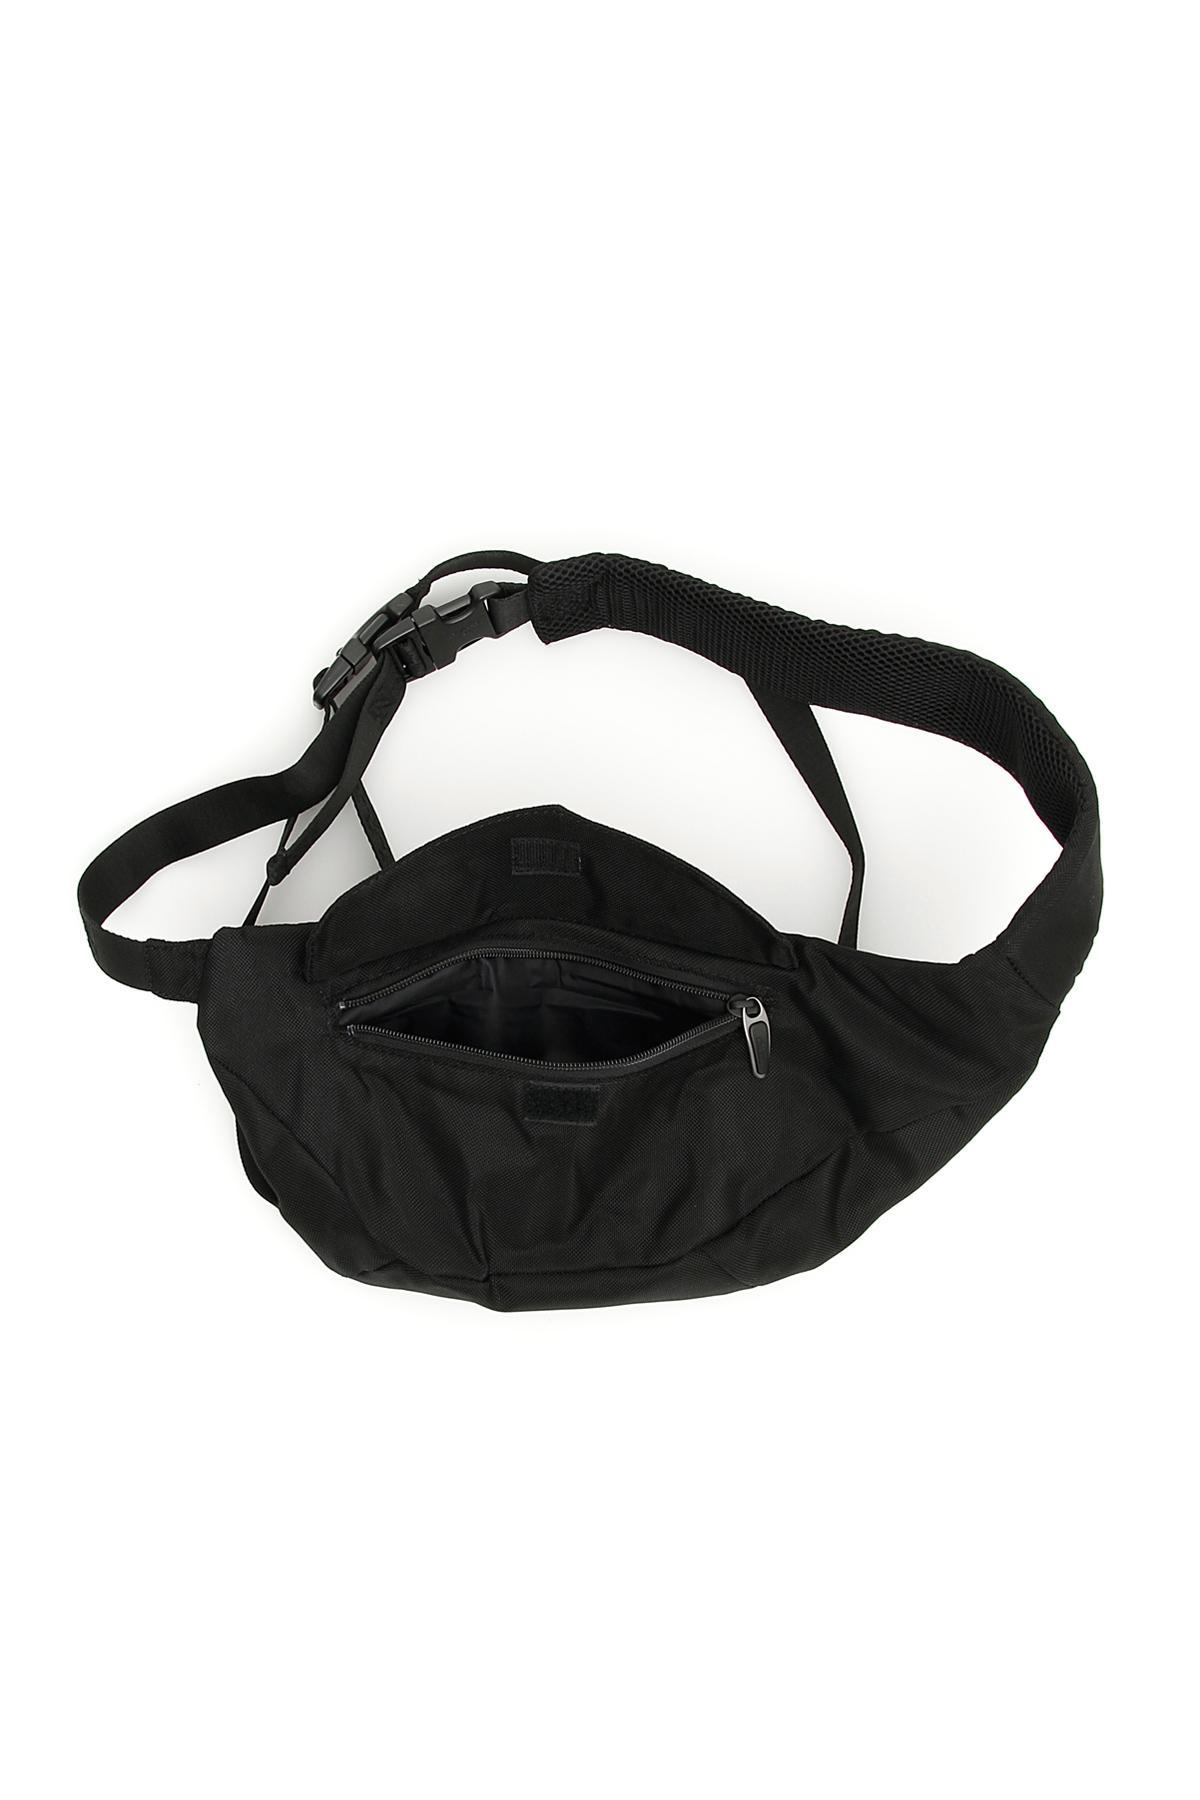 fbef2067c10a Lyst - Martine Rose Nylon Beltbag in Black for Men